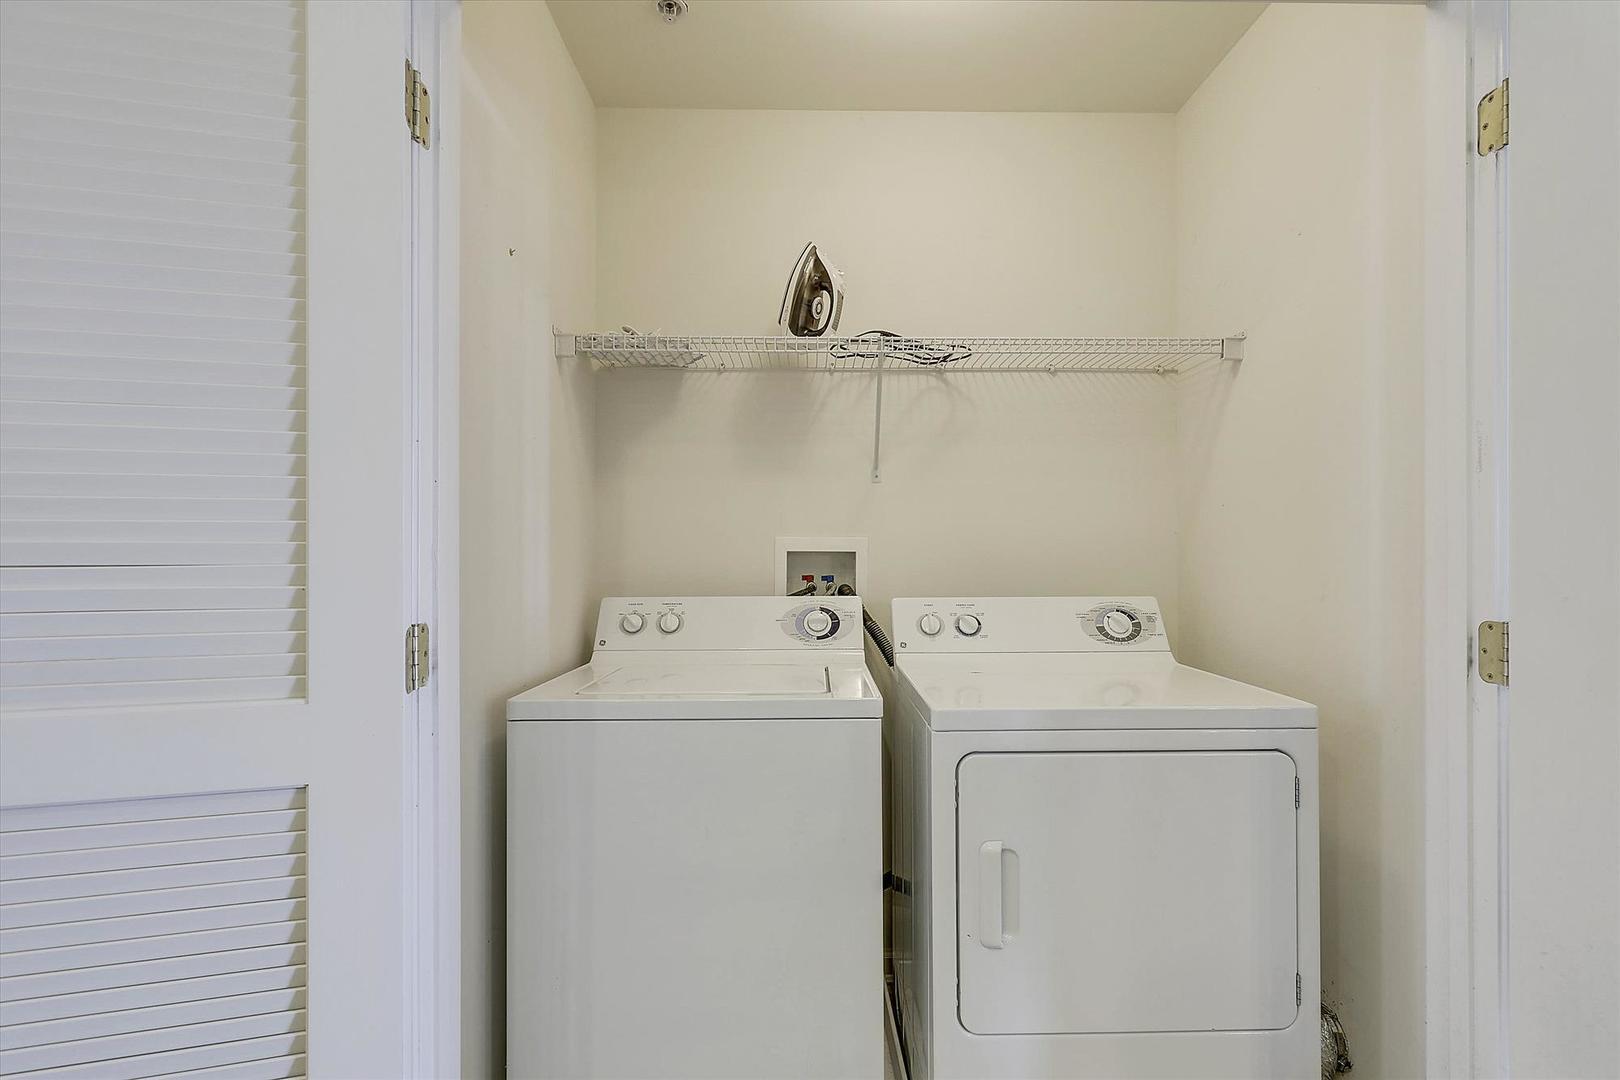 Sunset Island 37 FDW 5D - Laundry